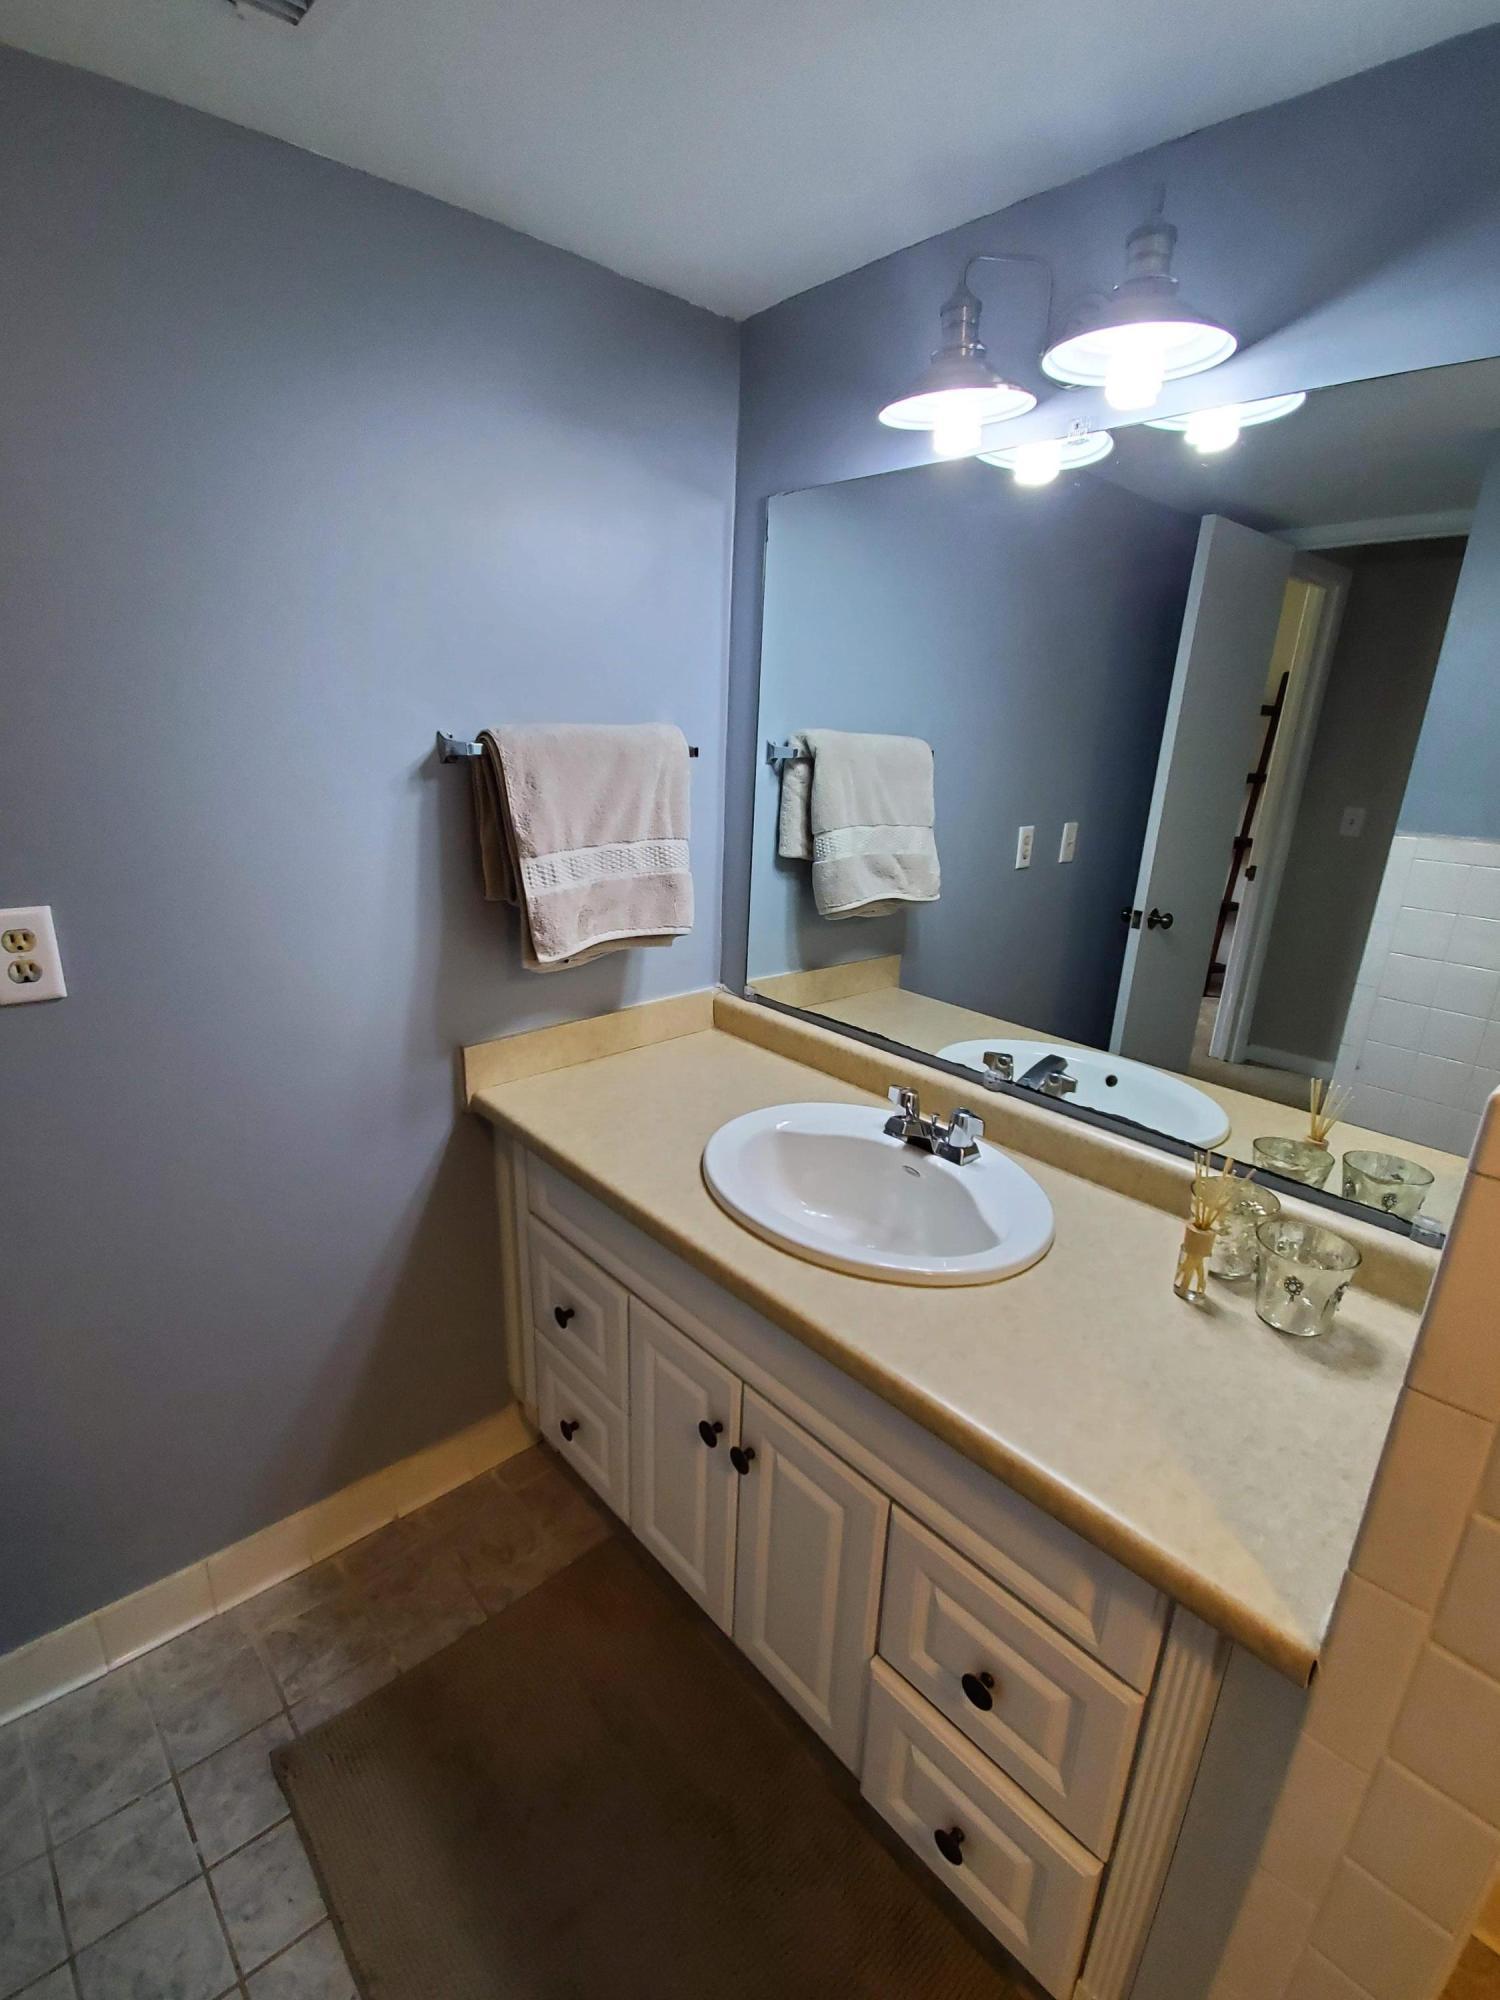 Snee Farm Homes For Sale - 105 Ventura, Mount Pleasant, SC - 38